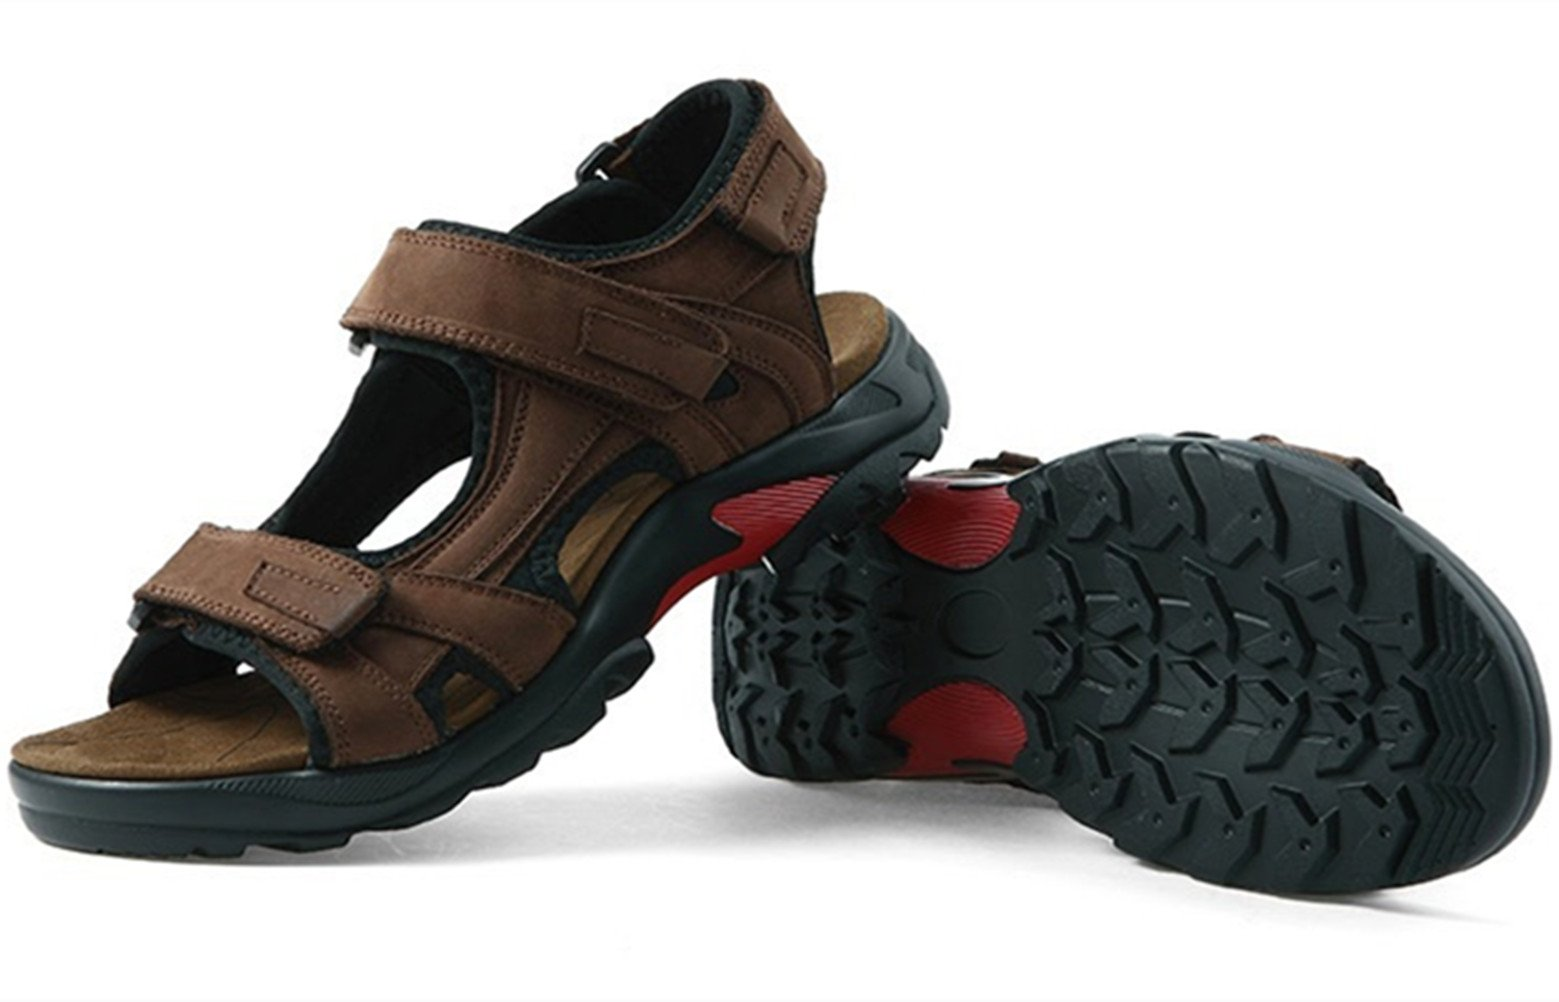 DADAWEN Men's Summer Leather Outdoor Beach Adjustable Strap Athletic Sport Sandals Brown US Size 11